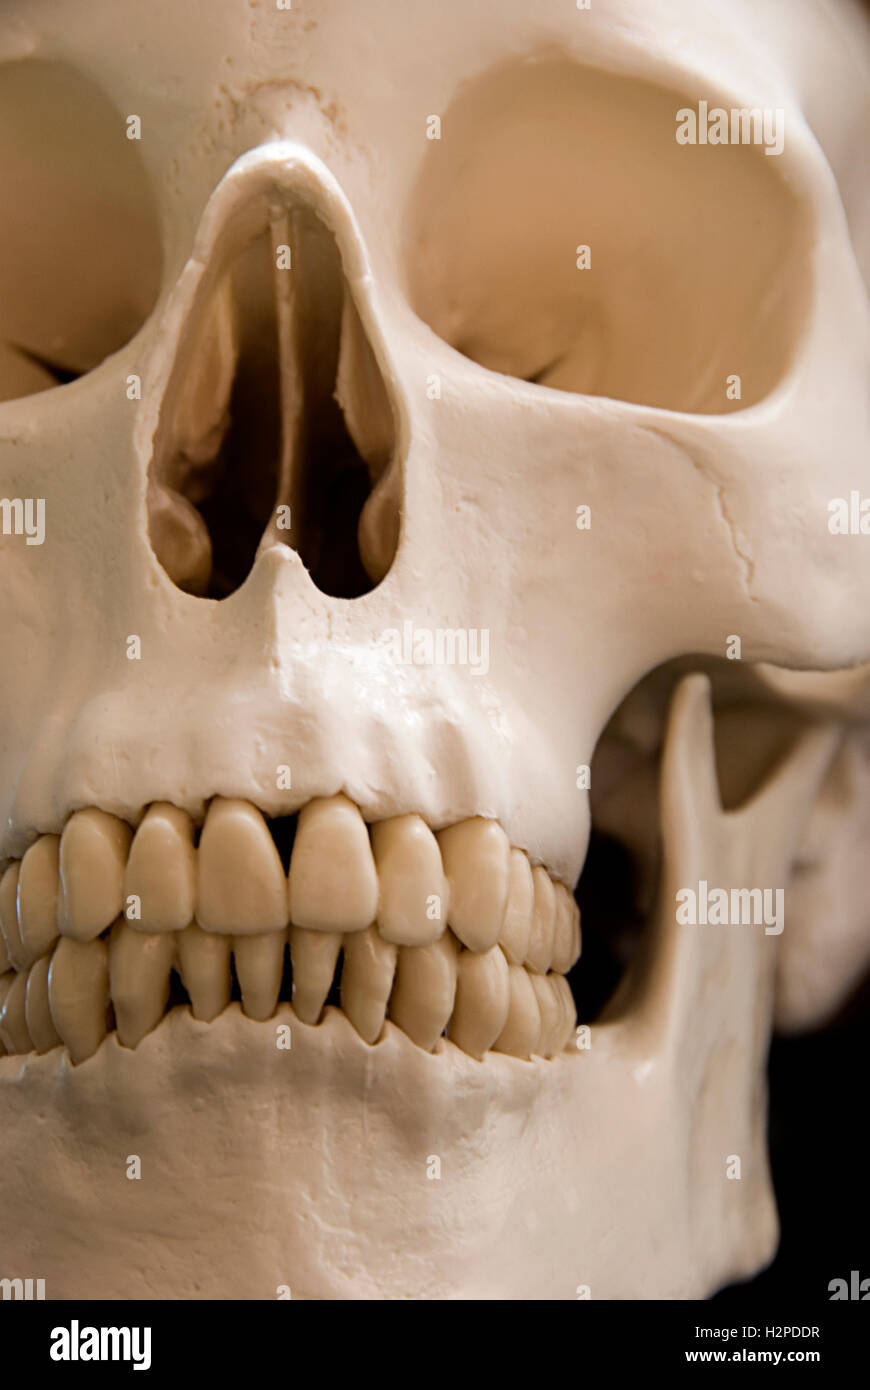 human skull closeup - Stock Image